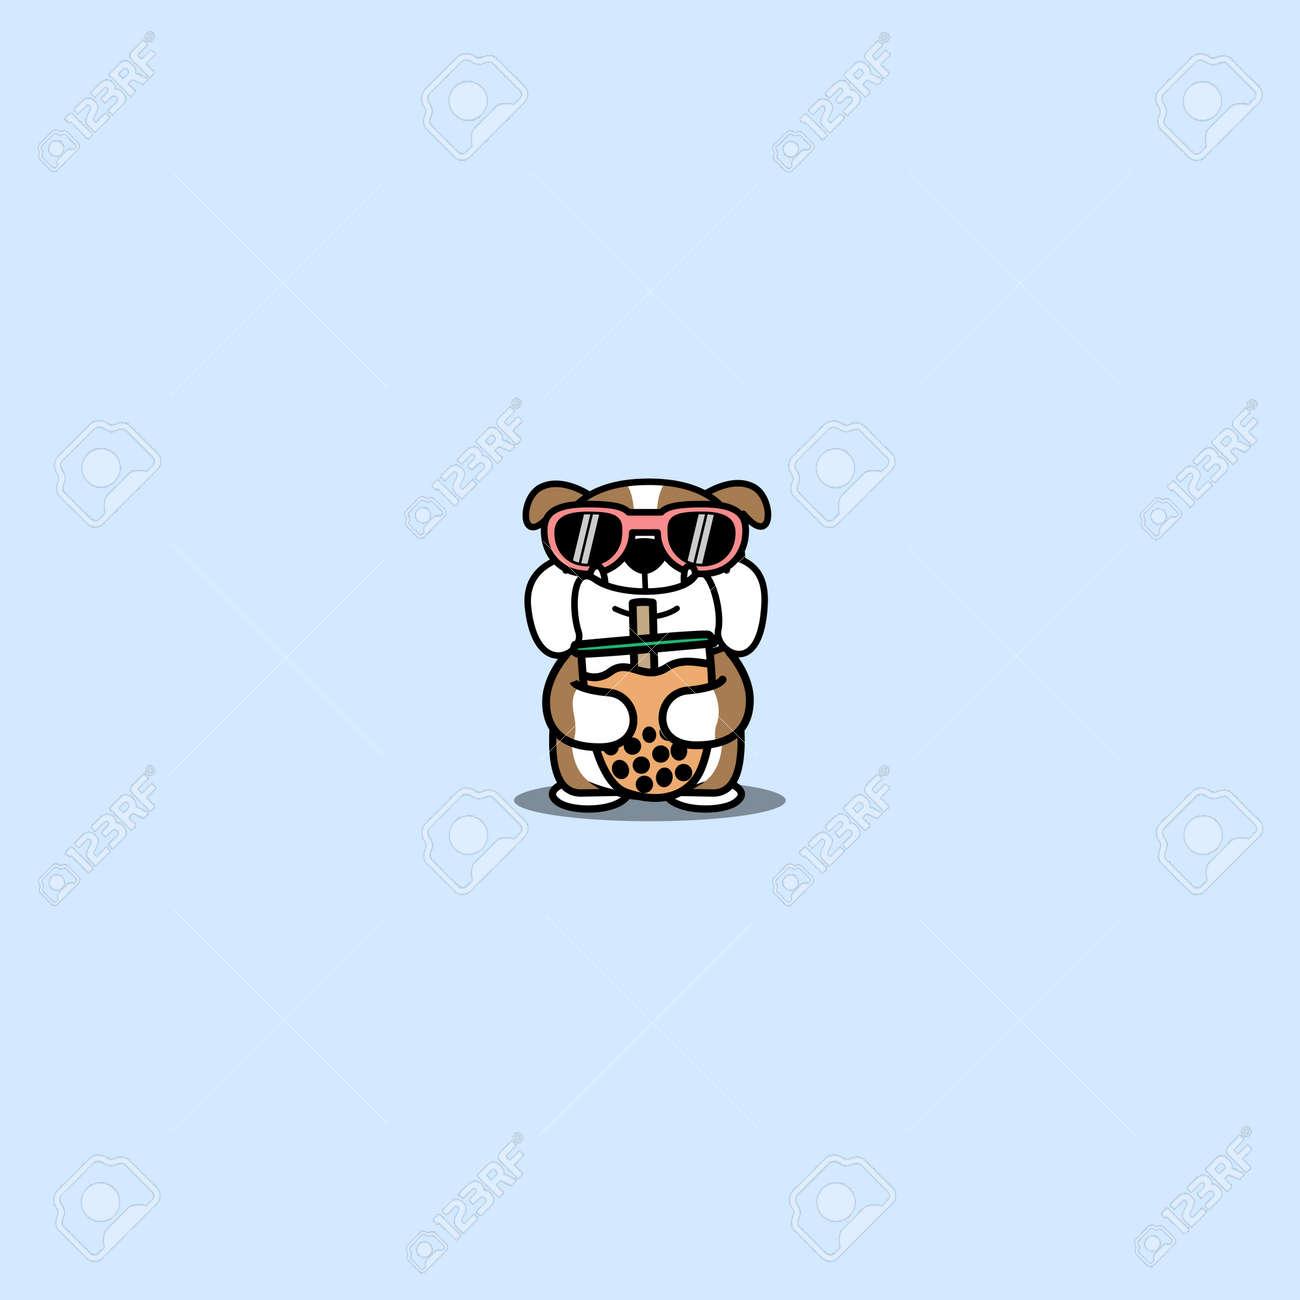 Cute english bulldog with sunglasses hugging bubble tea cartoon, vector illustration - 164045007